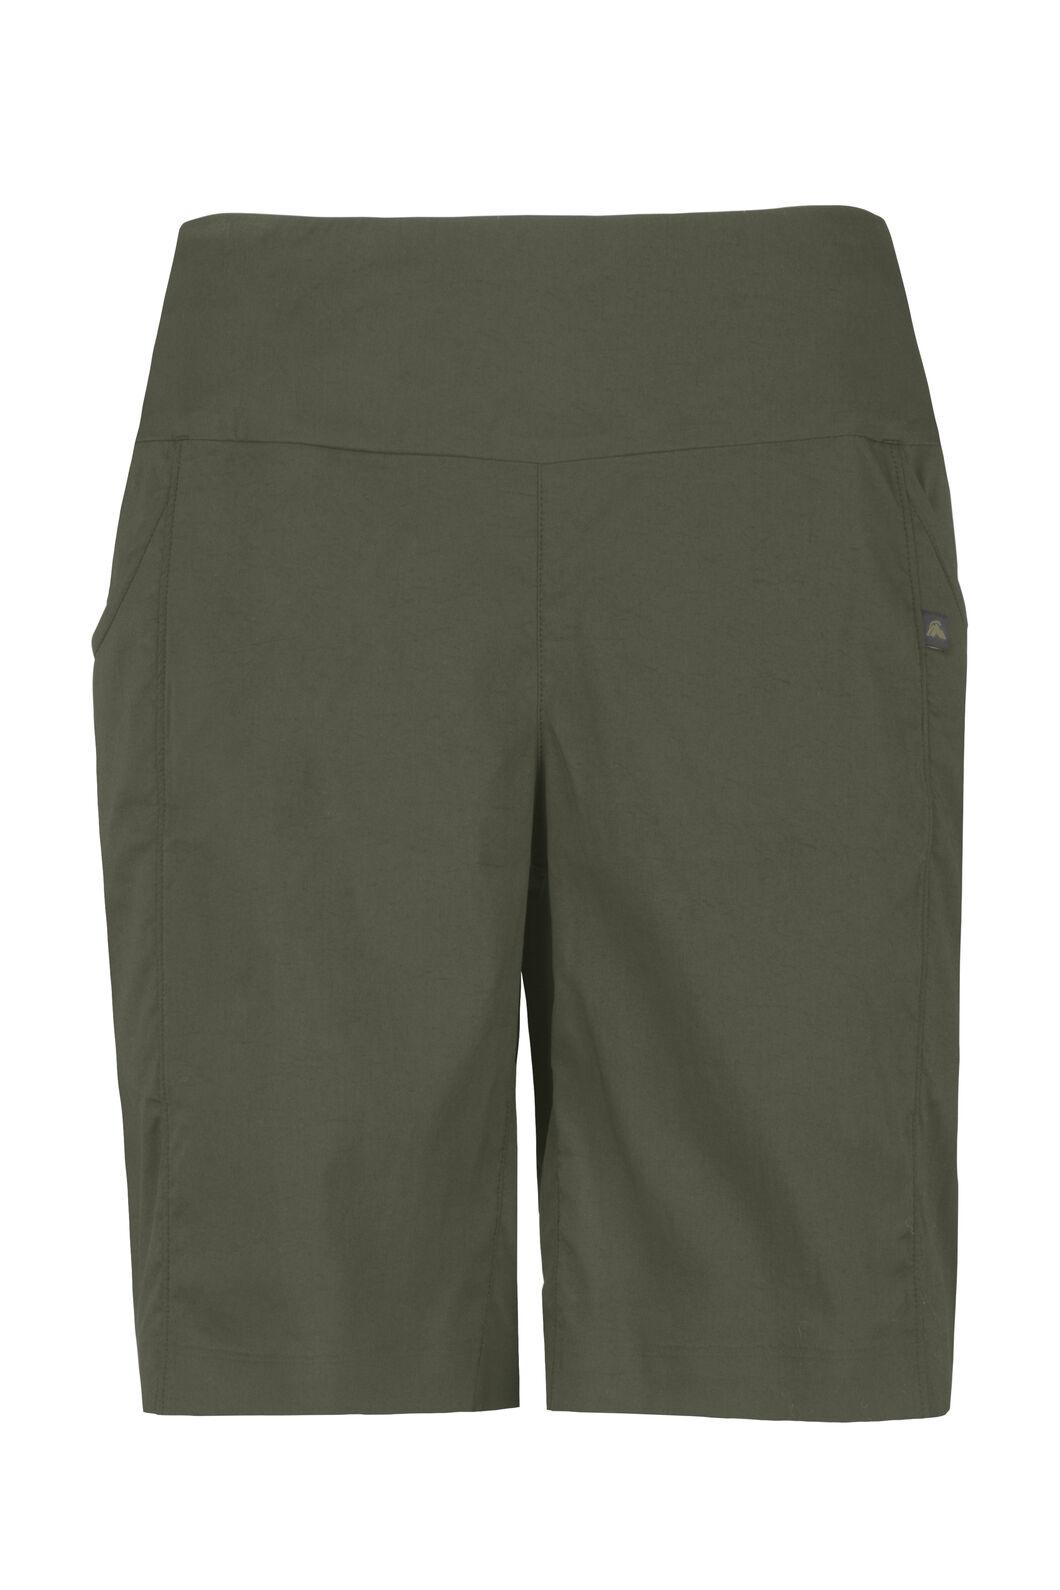 Macpac Ria Shorts - Women's, Grape Leaf, hi-res